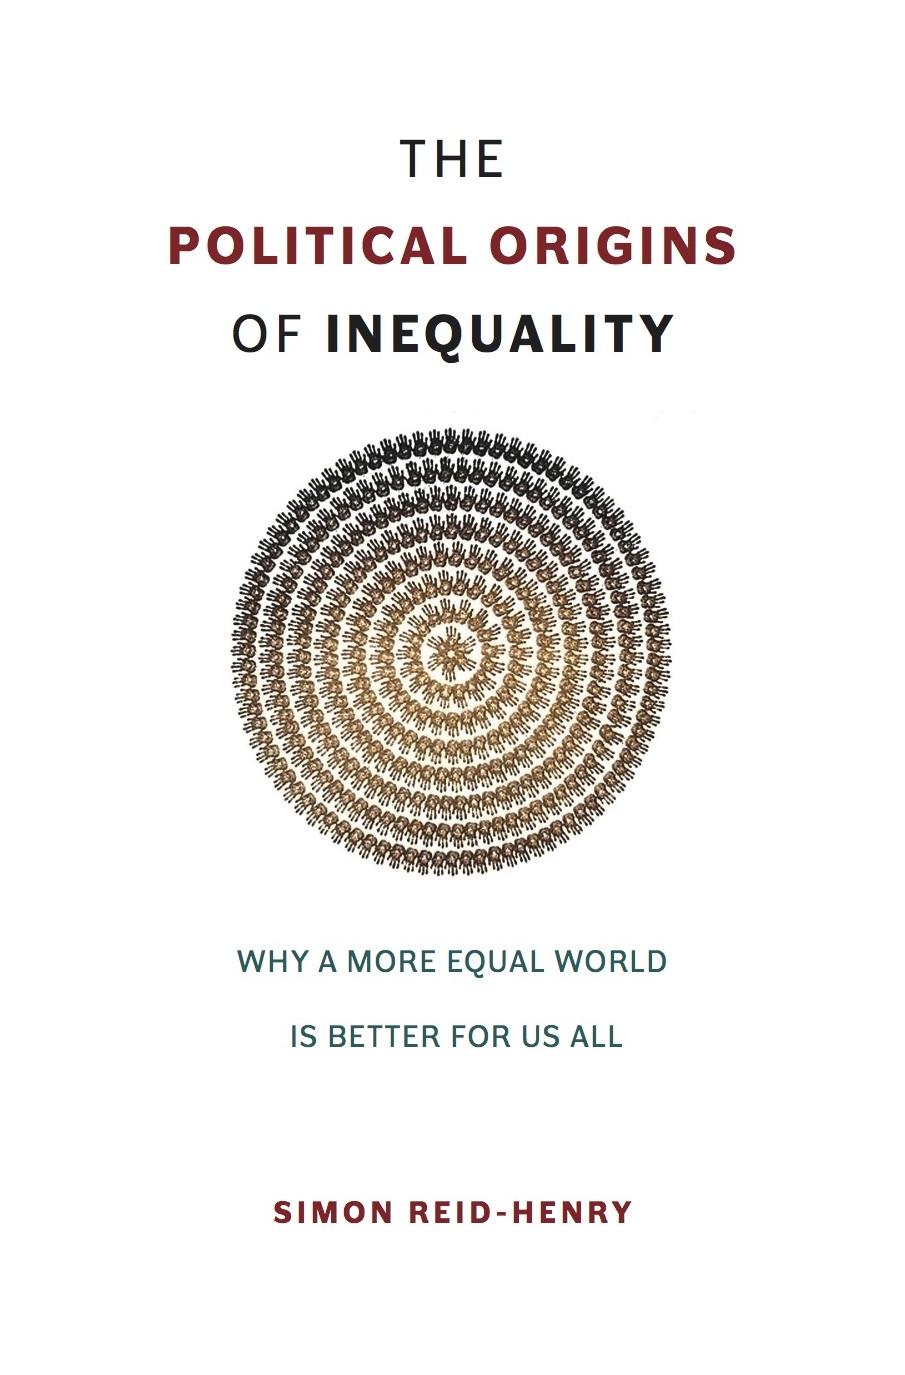 Reid-Henry_Inequality_Design.jpeg